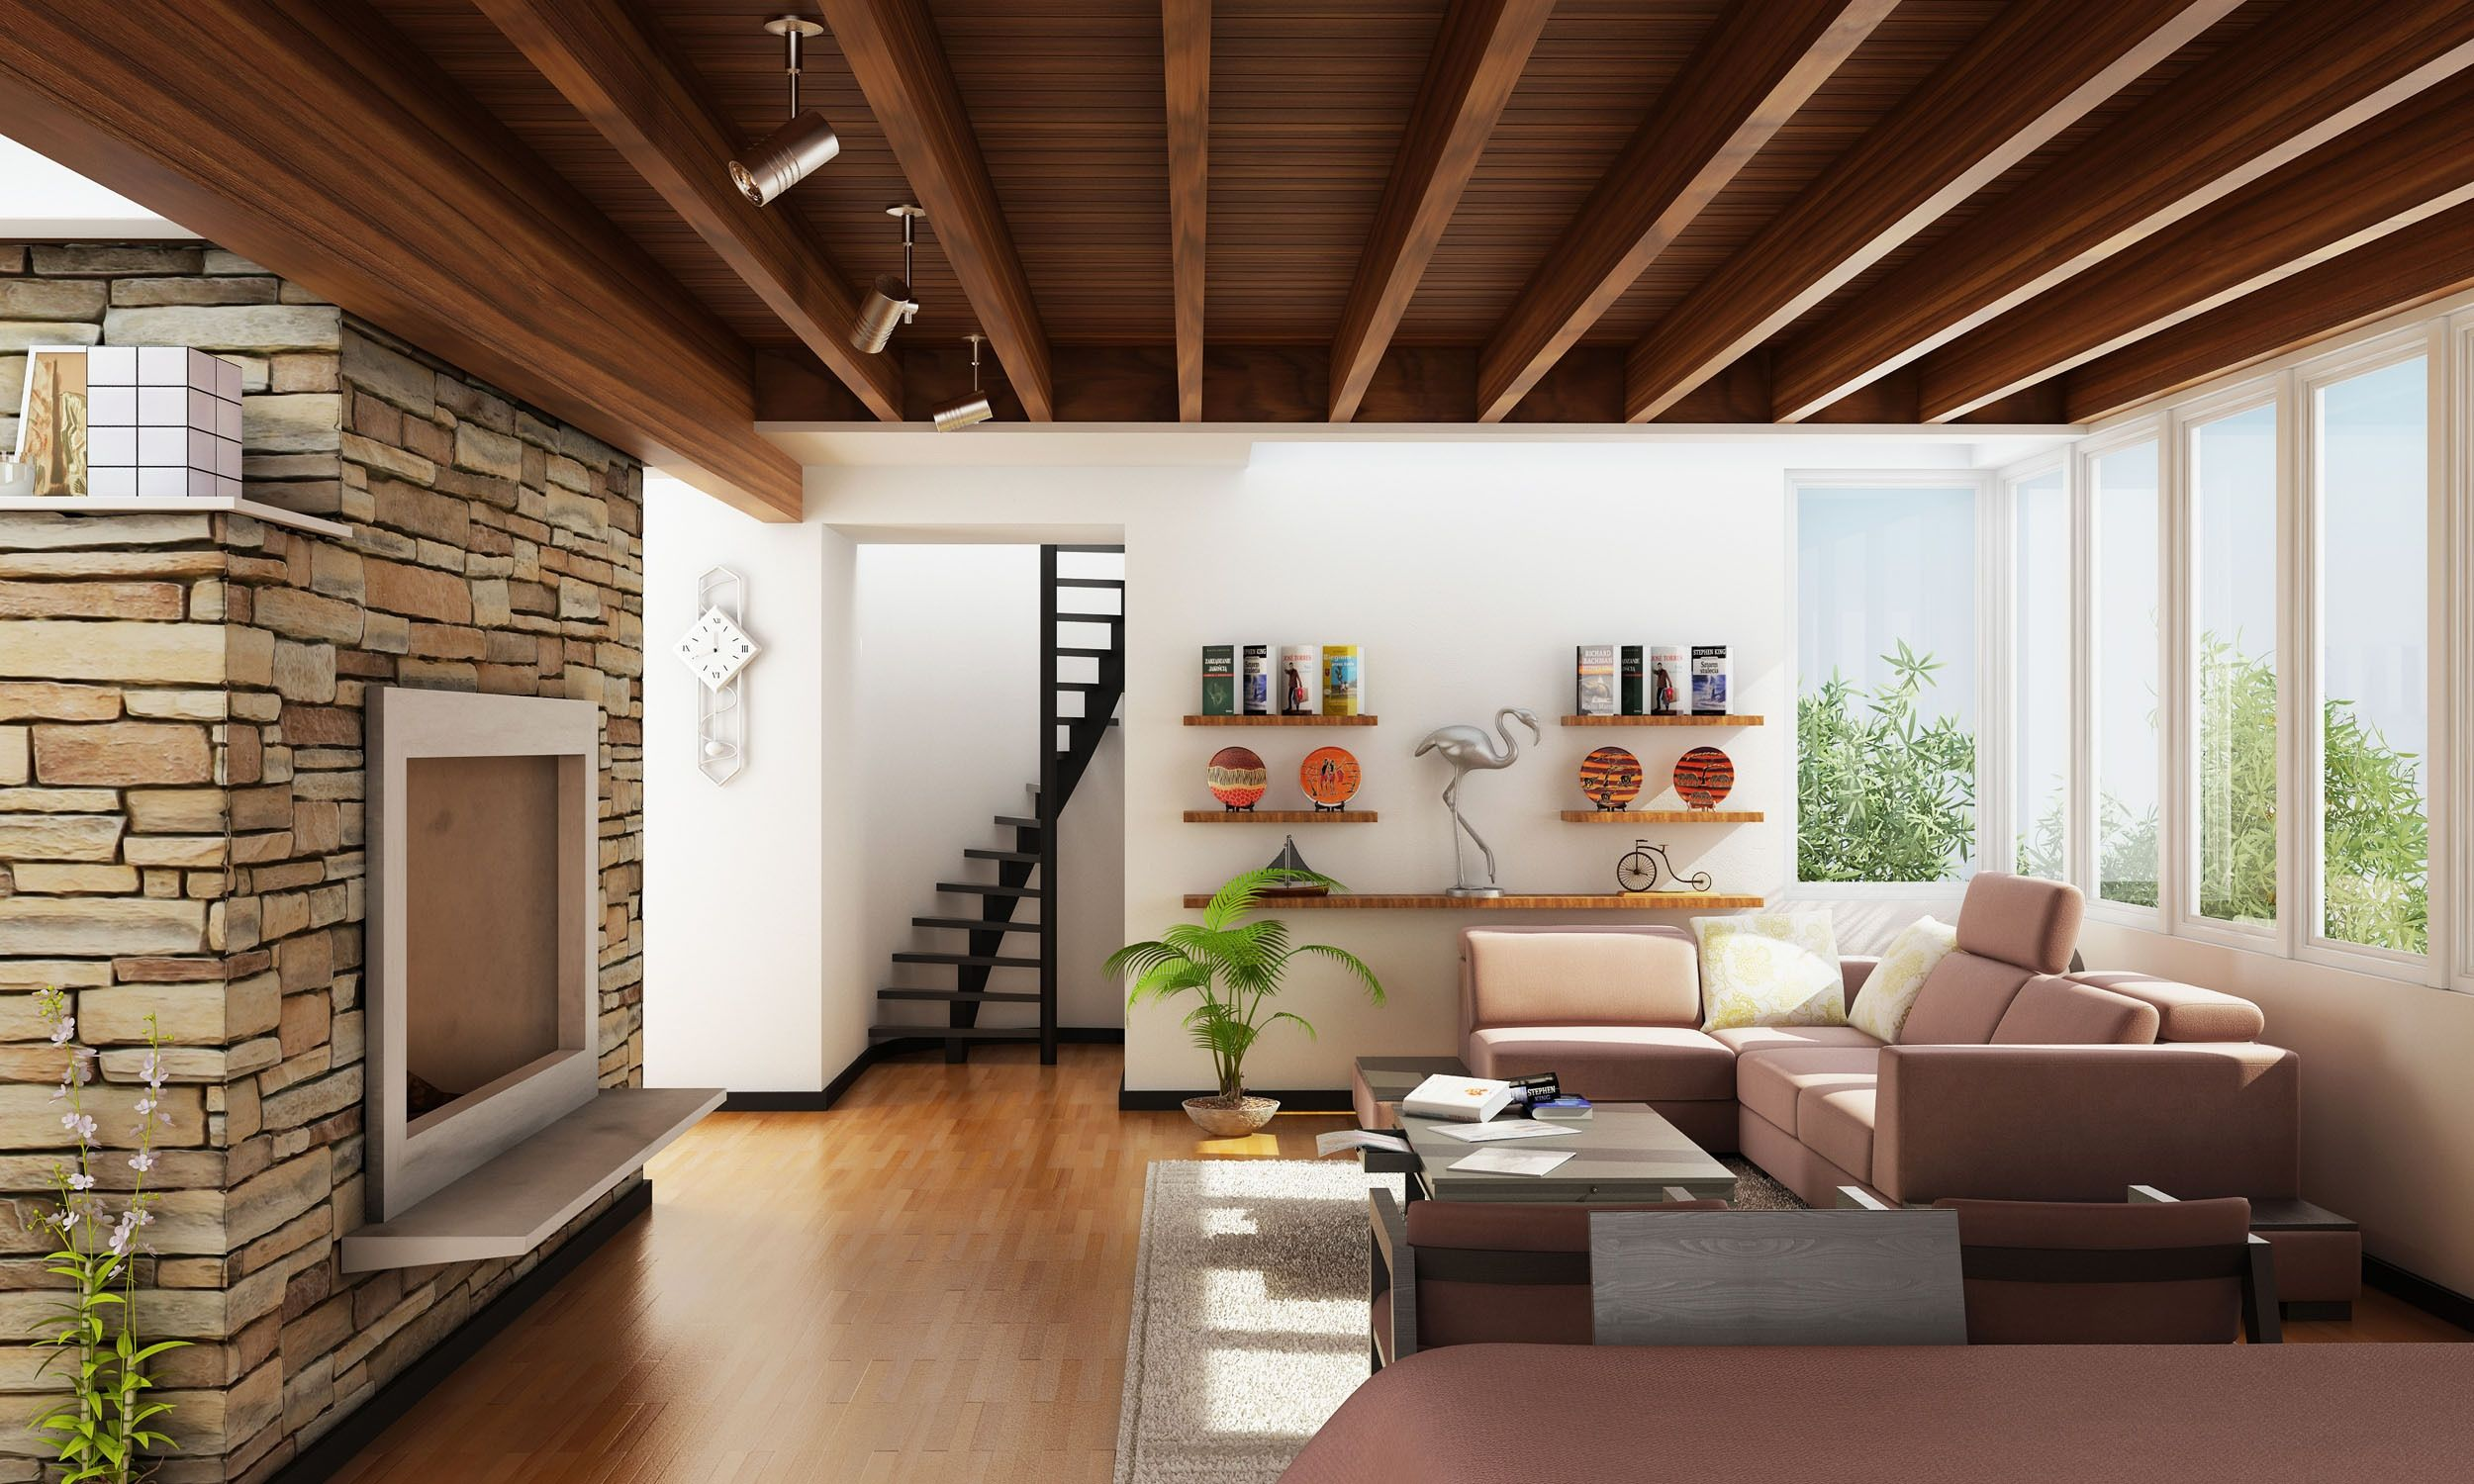 2500x1500 wallpaper interior design style design home villa living room